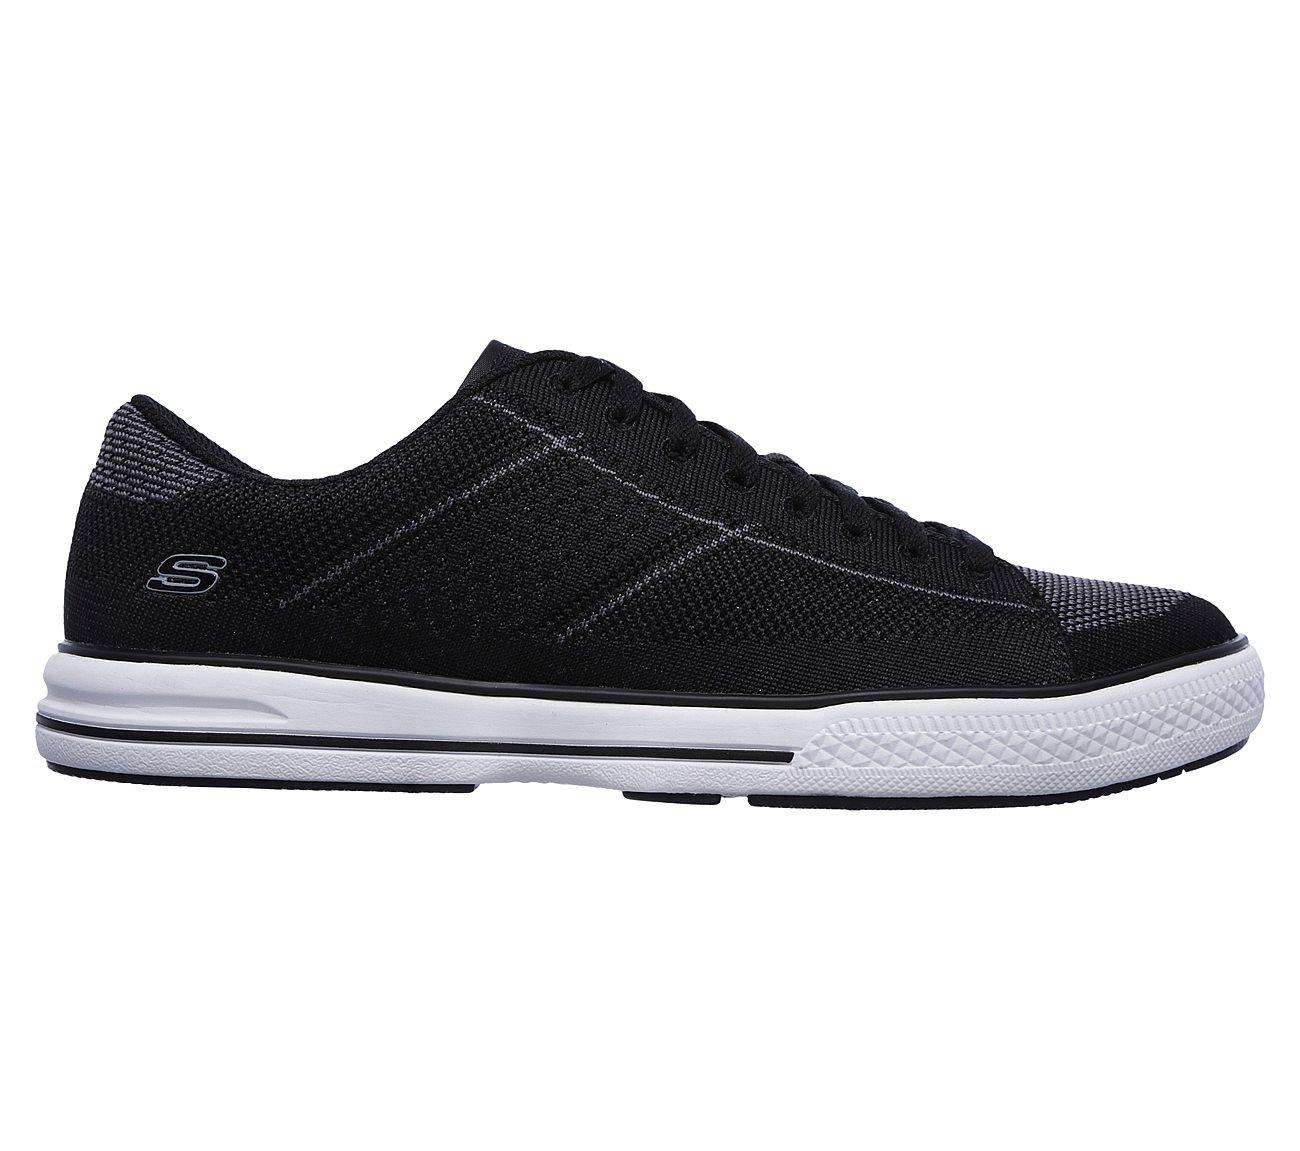 Buy SKECHERS Arcade - Vontae Sport Shoes